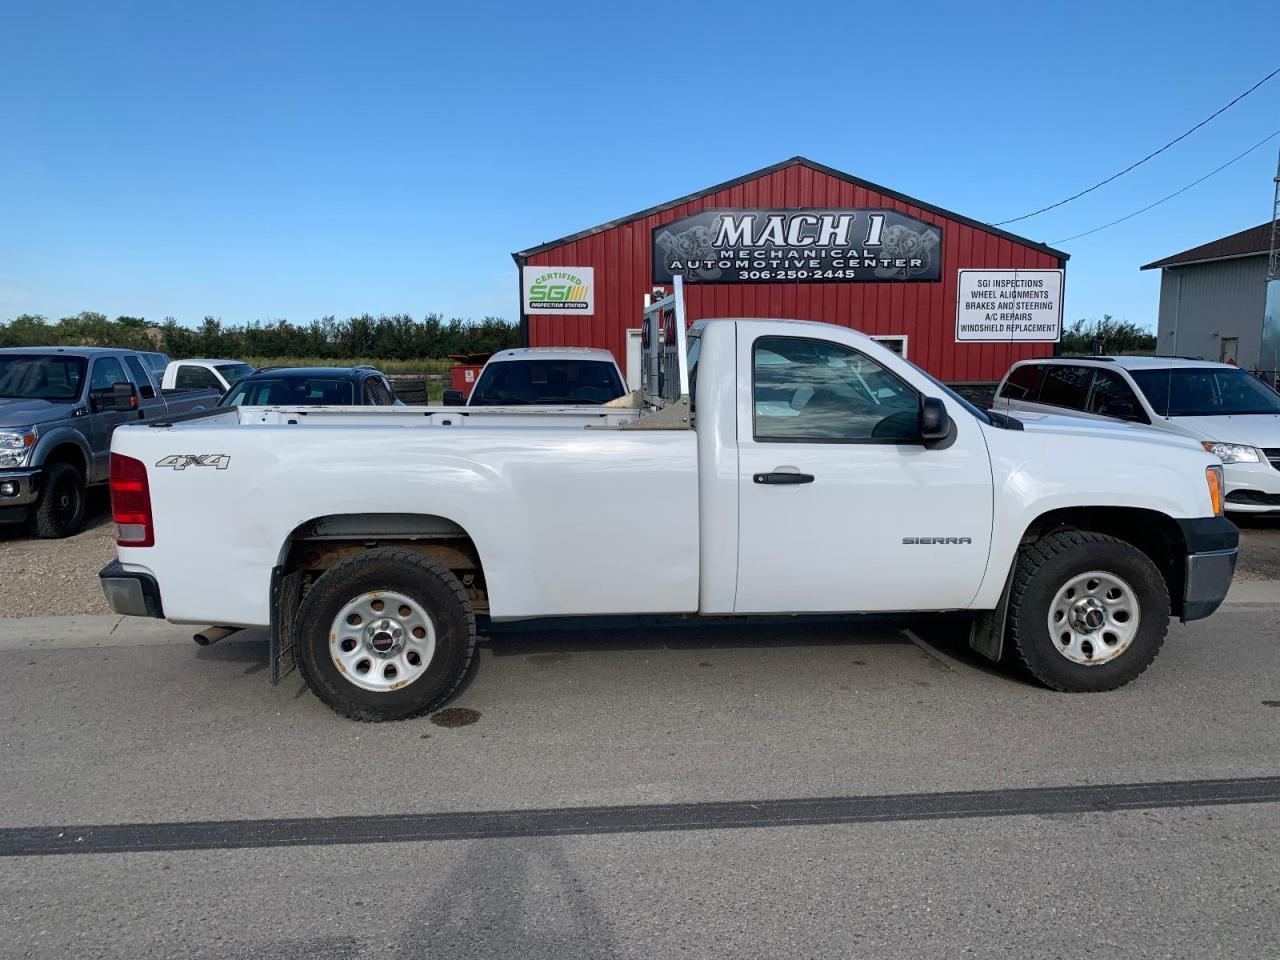 used 2013 gmc sierra 1500 wt for sale in osler, saskatchewan carpages.ca